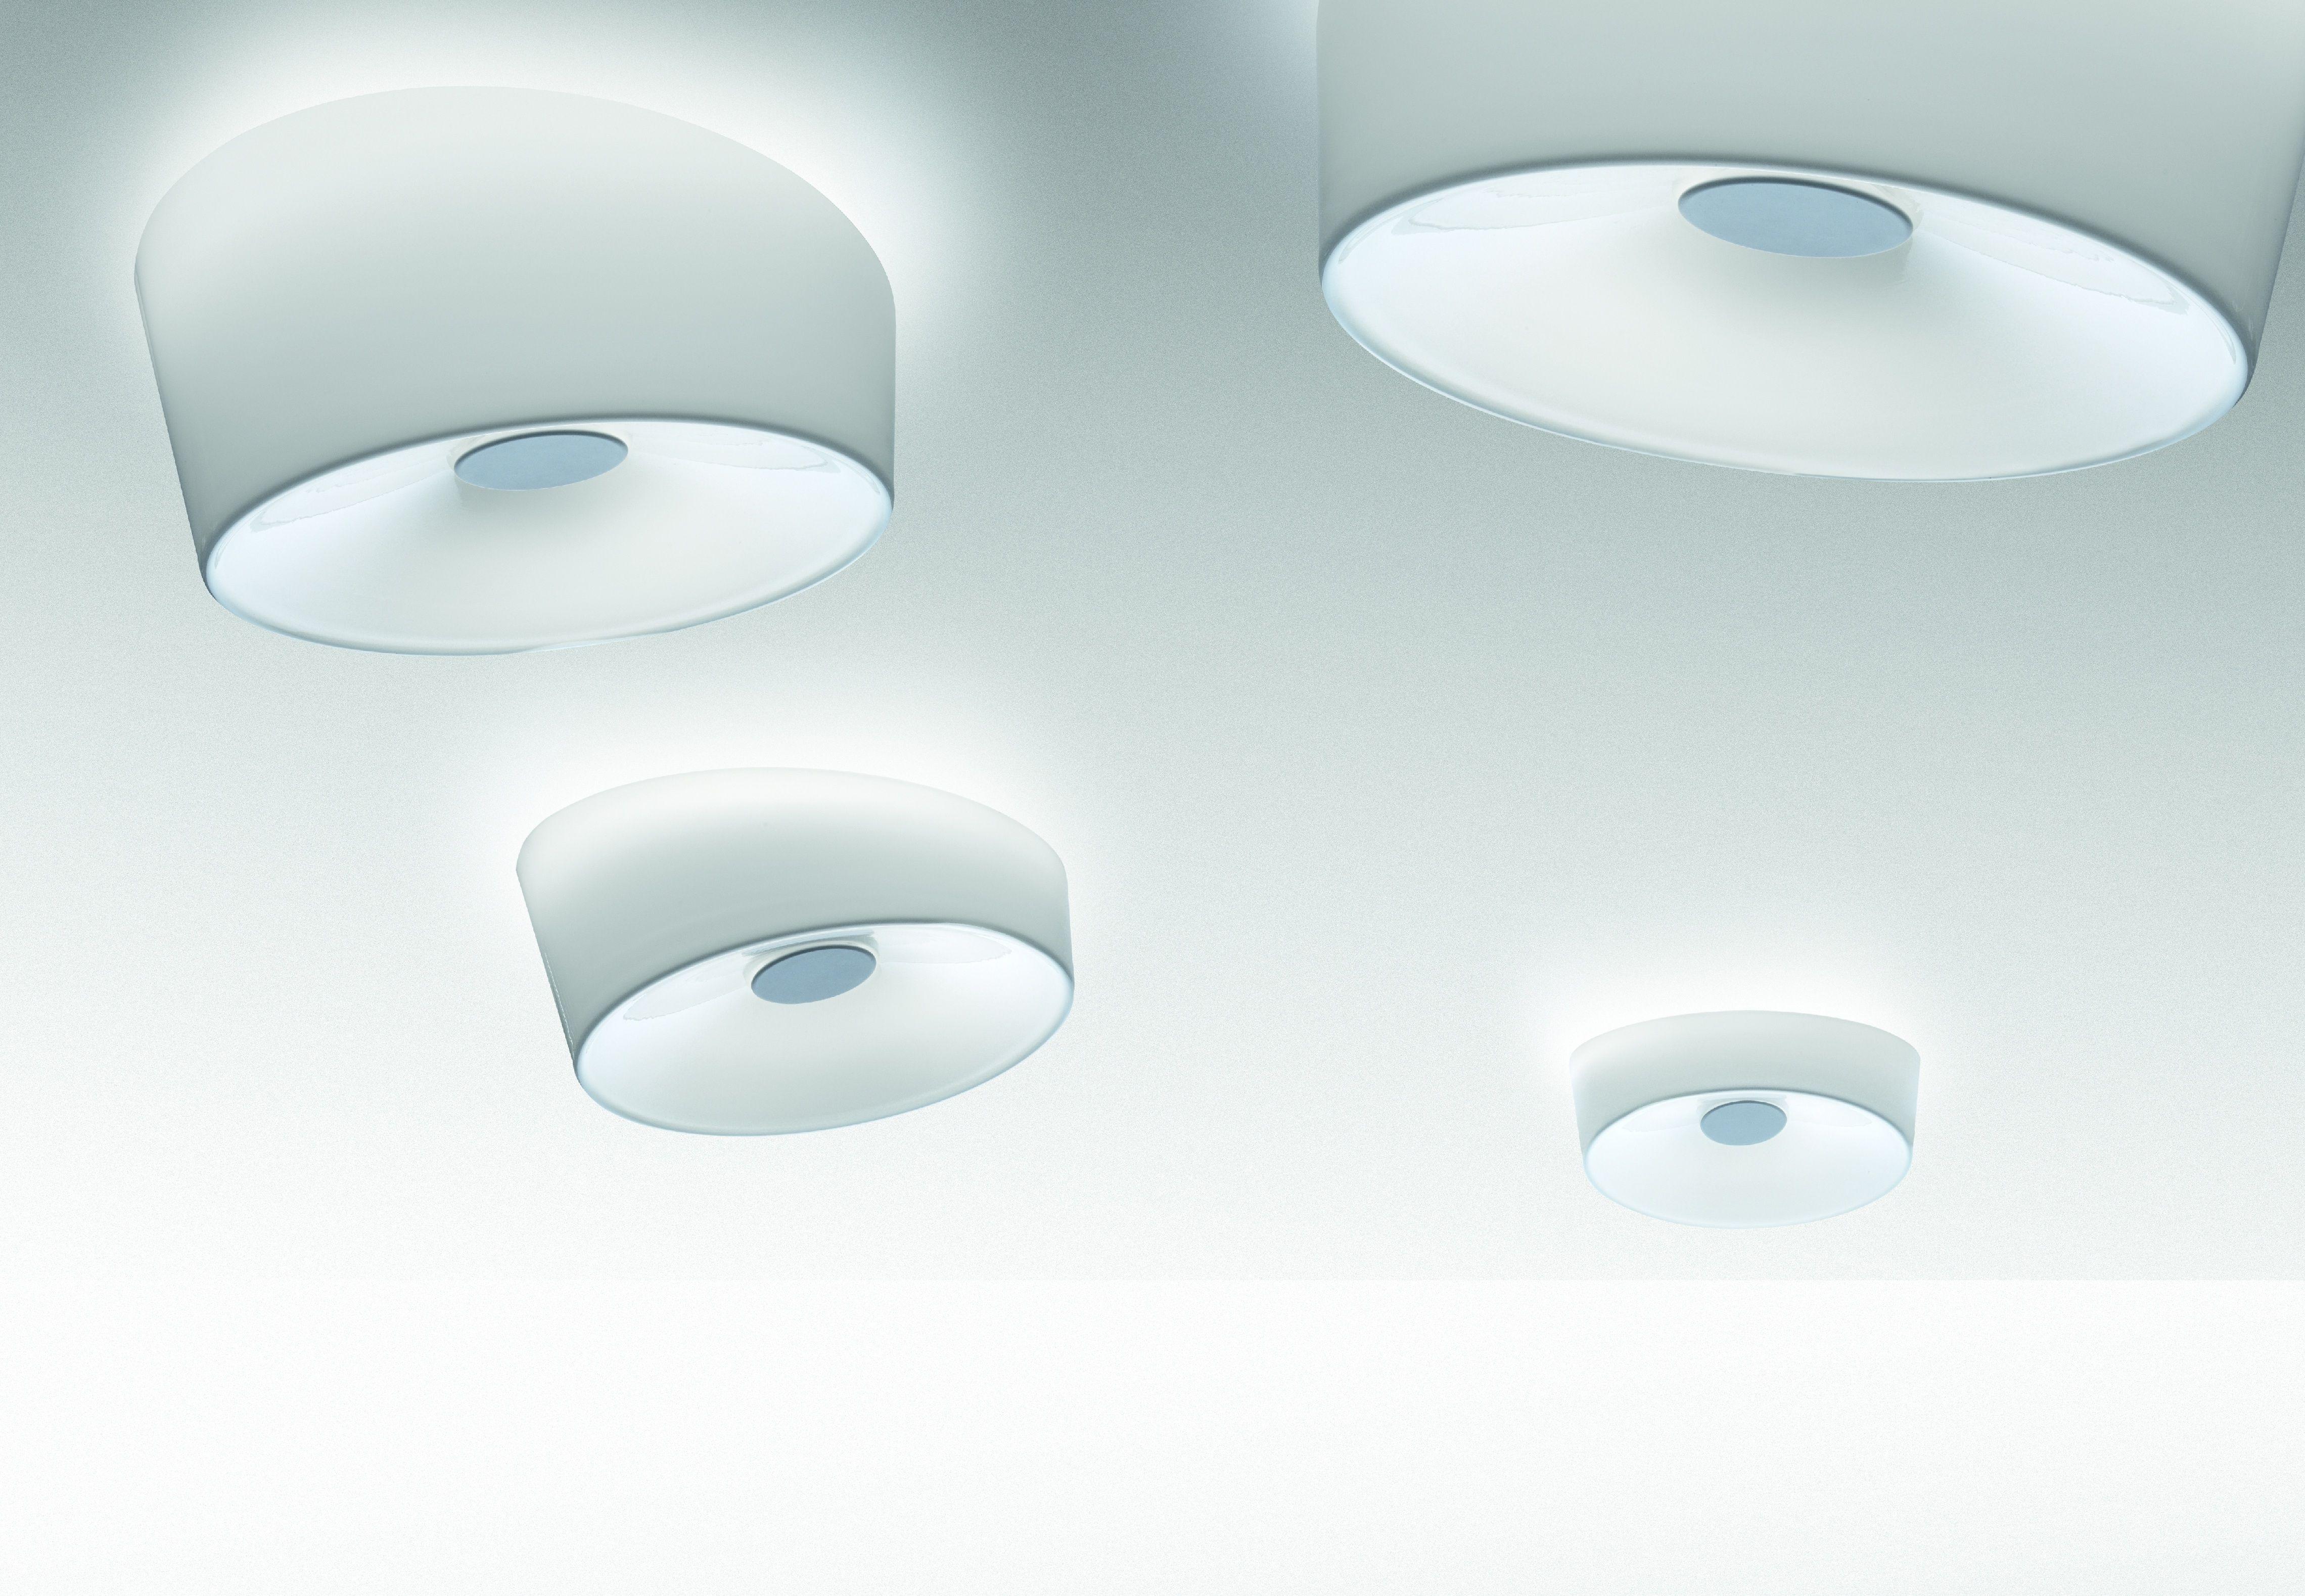 Plafoniere Foscarini : Scopri plafoniera lumiere xxl bianco di foscarini